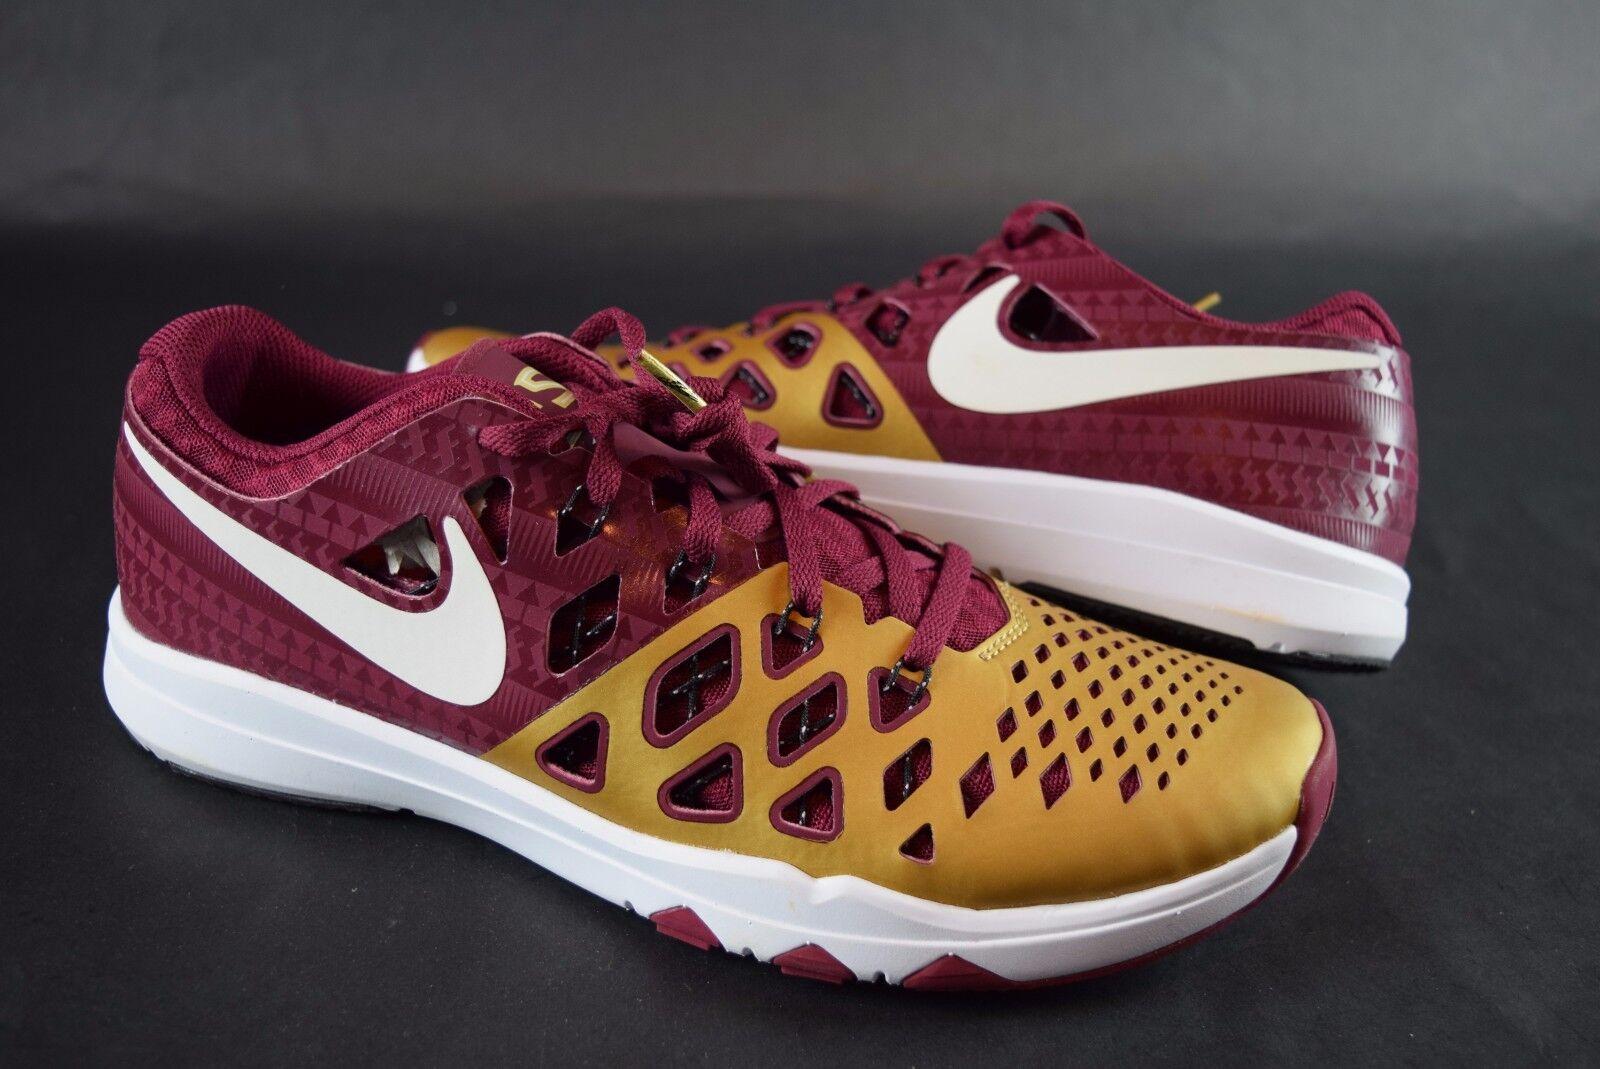 New Uomo Nike Train Speed 4 AMP 844102 844102 844102 617 sz 8.5-9.5 FLORIDA STATE SEMINOLES 4d306c